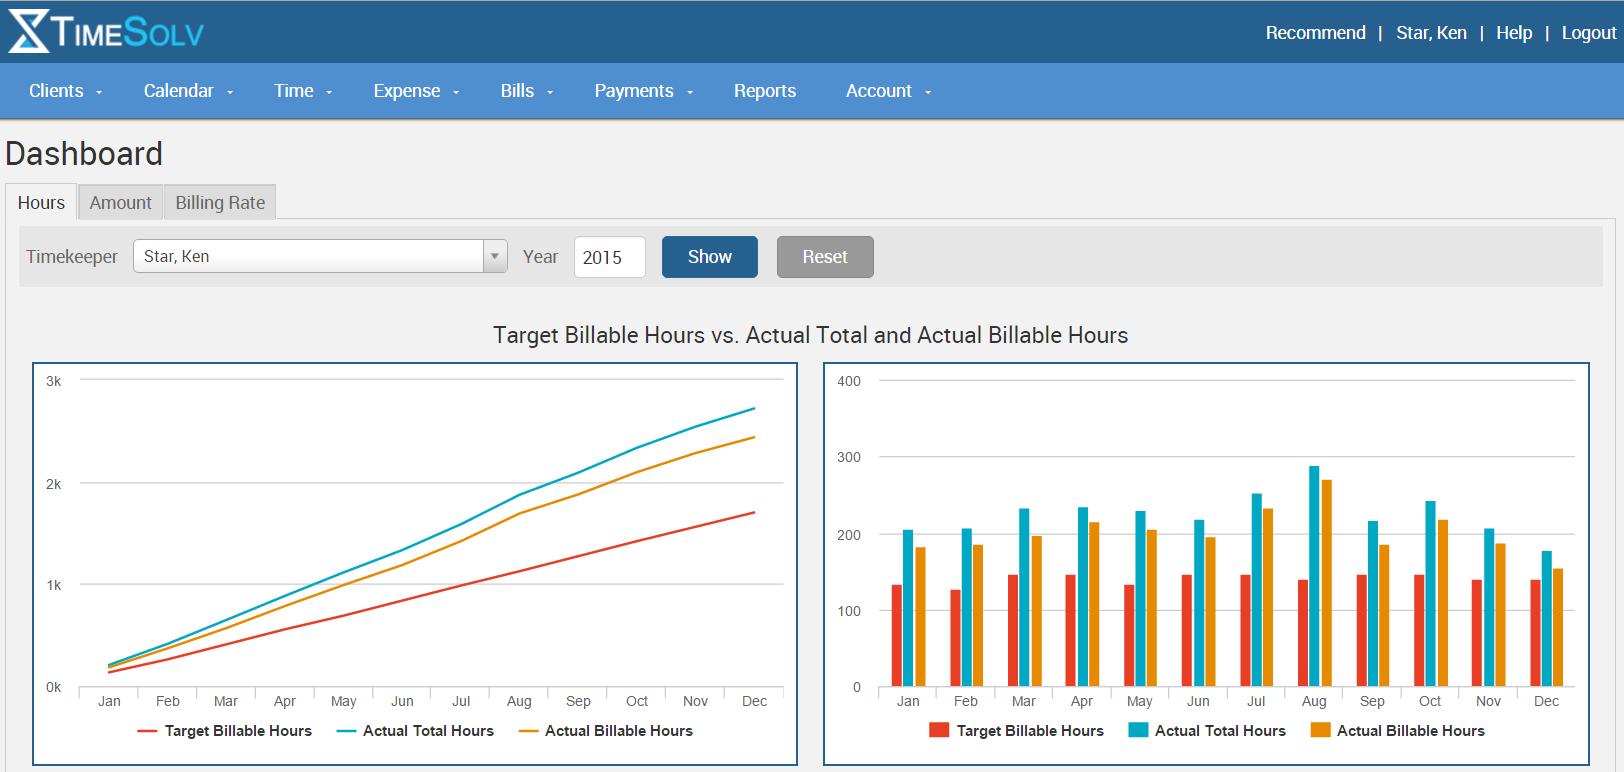 TimeSolv Legal Billing Software - TimeSolv dashboard screenshot